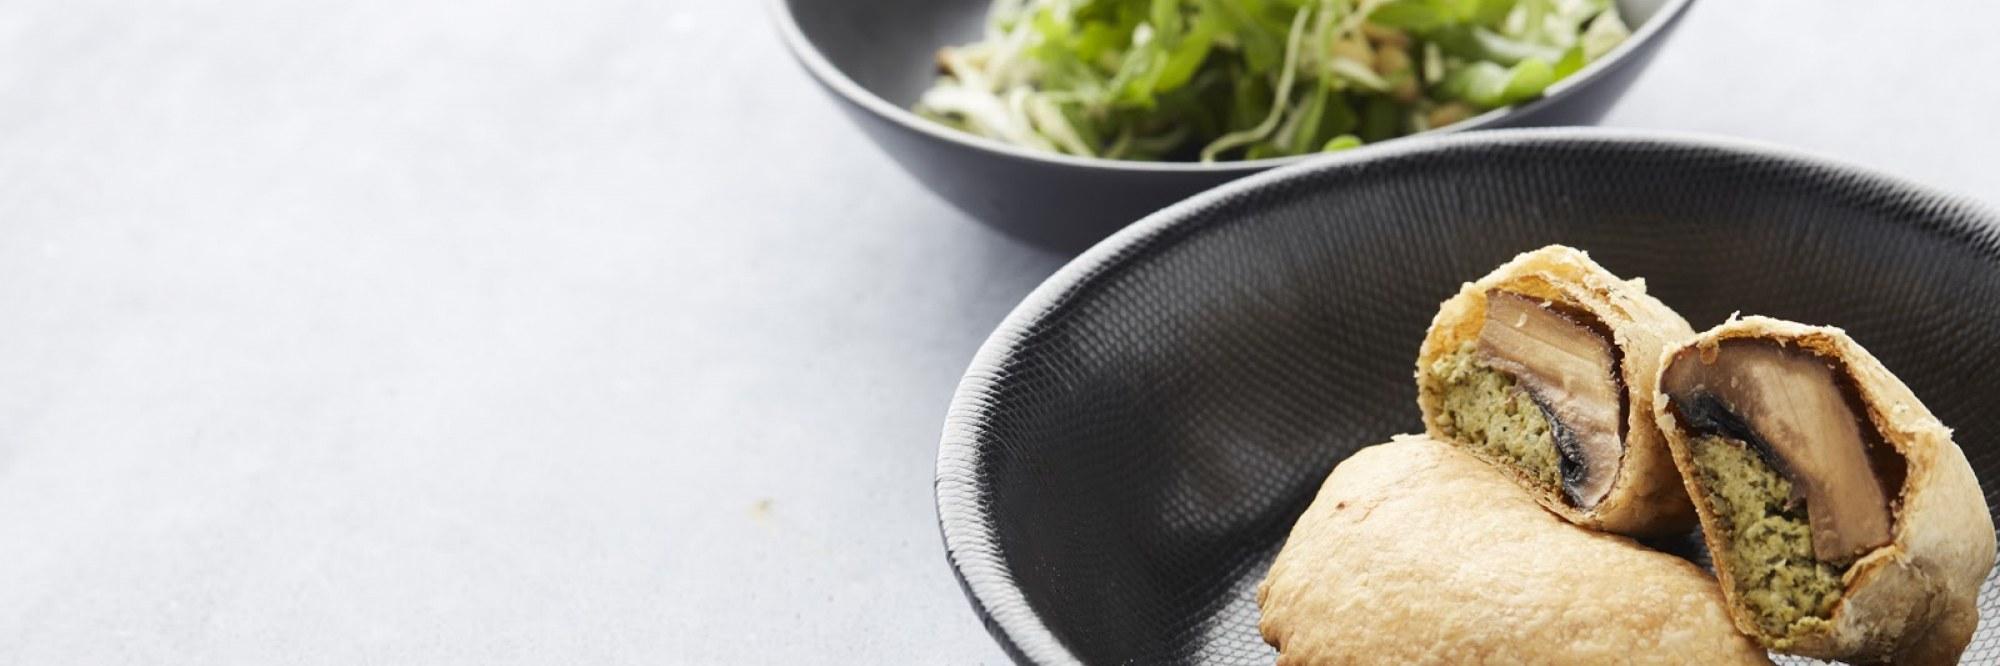 Portobellopasteitjes met tofupesto